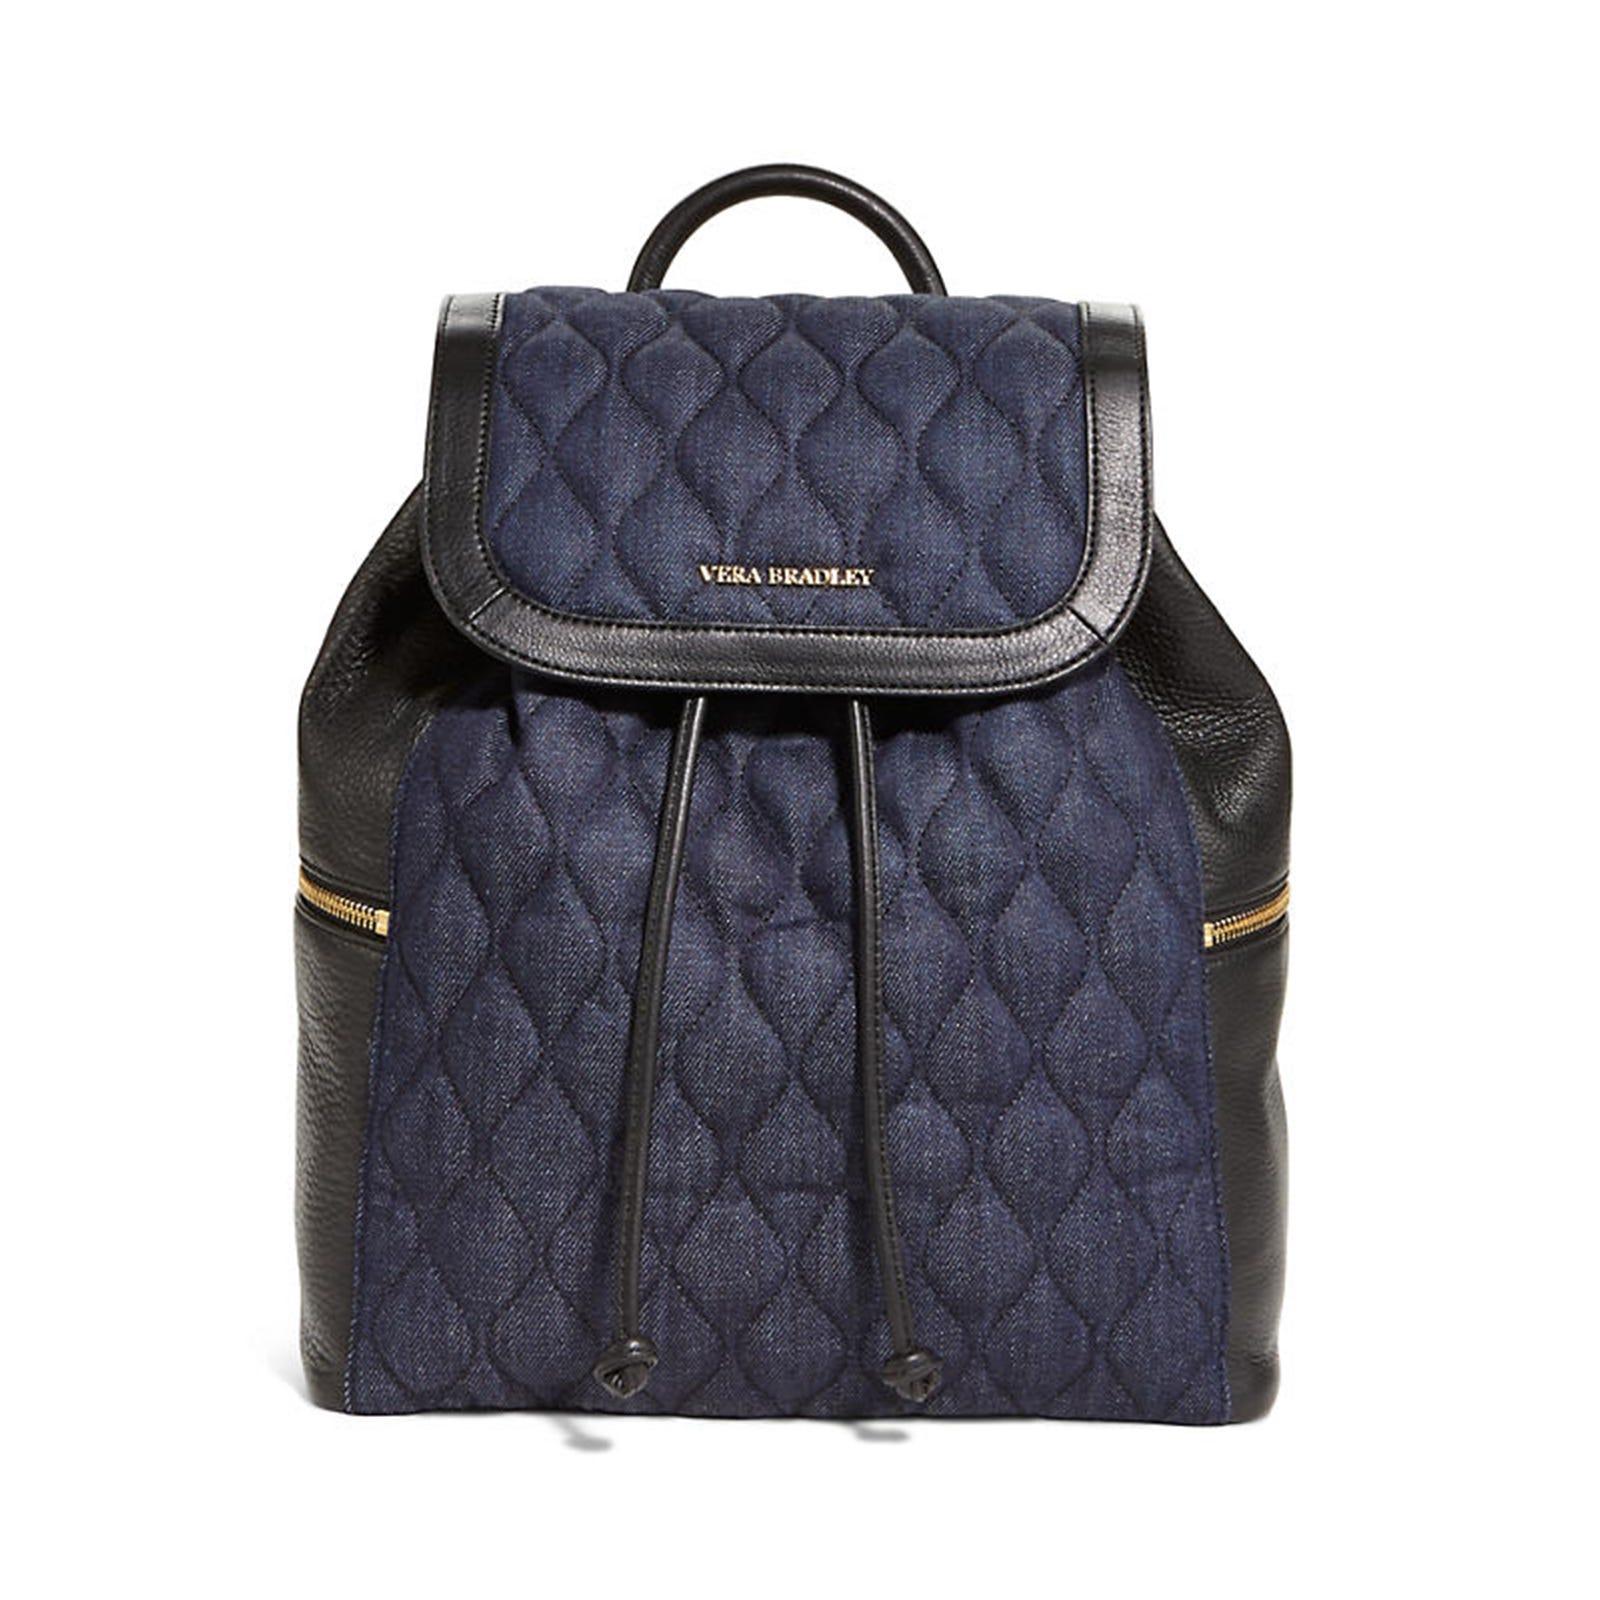 6d341b3d3326 Colorful Everyday Handbags